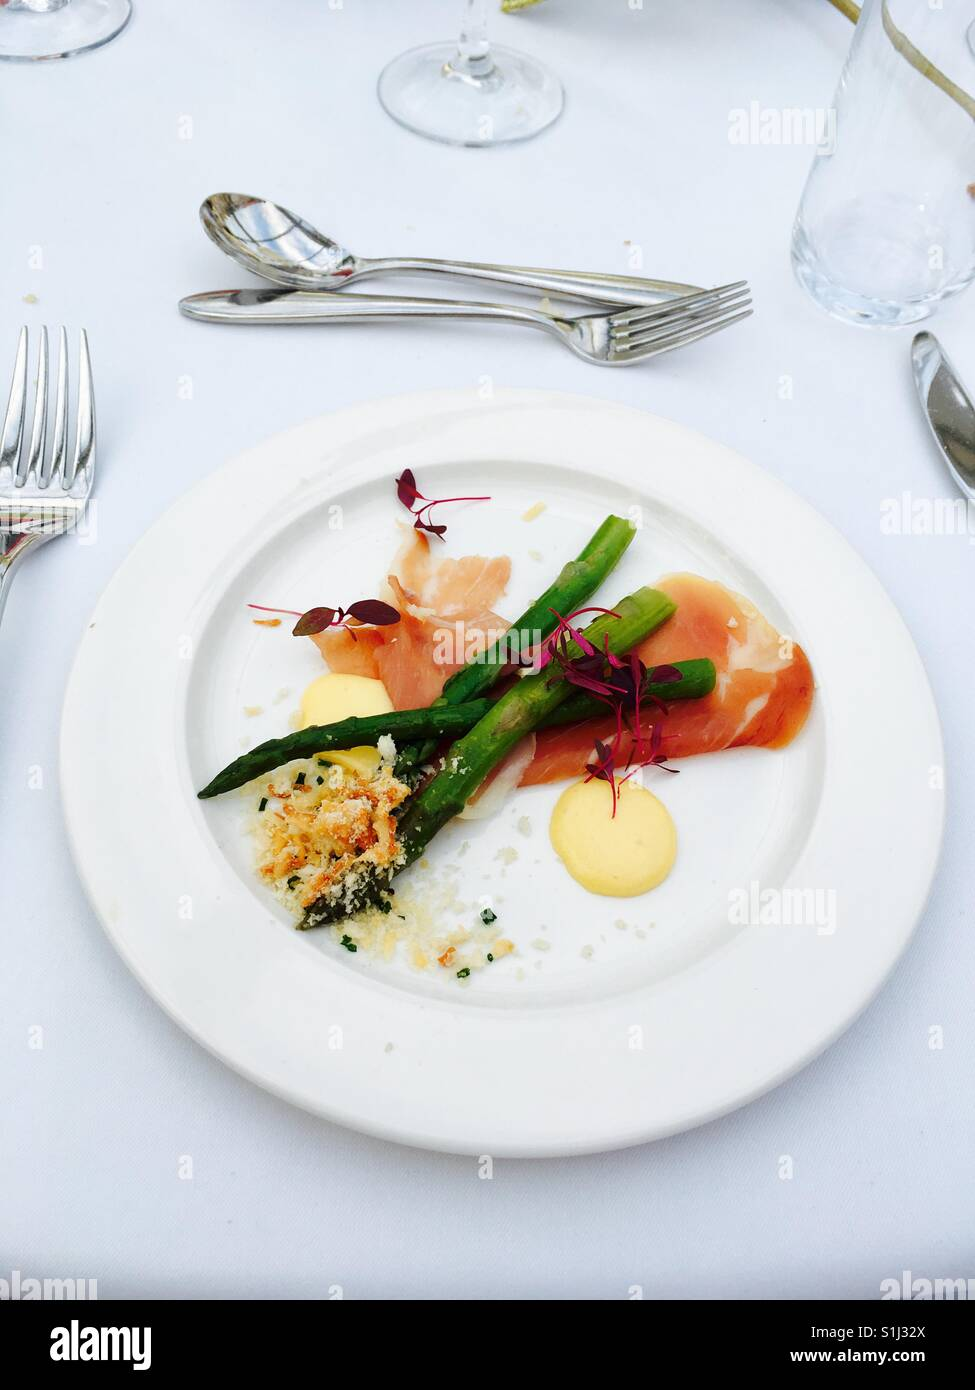 Asparagus and ham starter appetiser - Stock Image